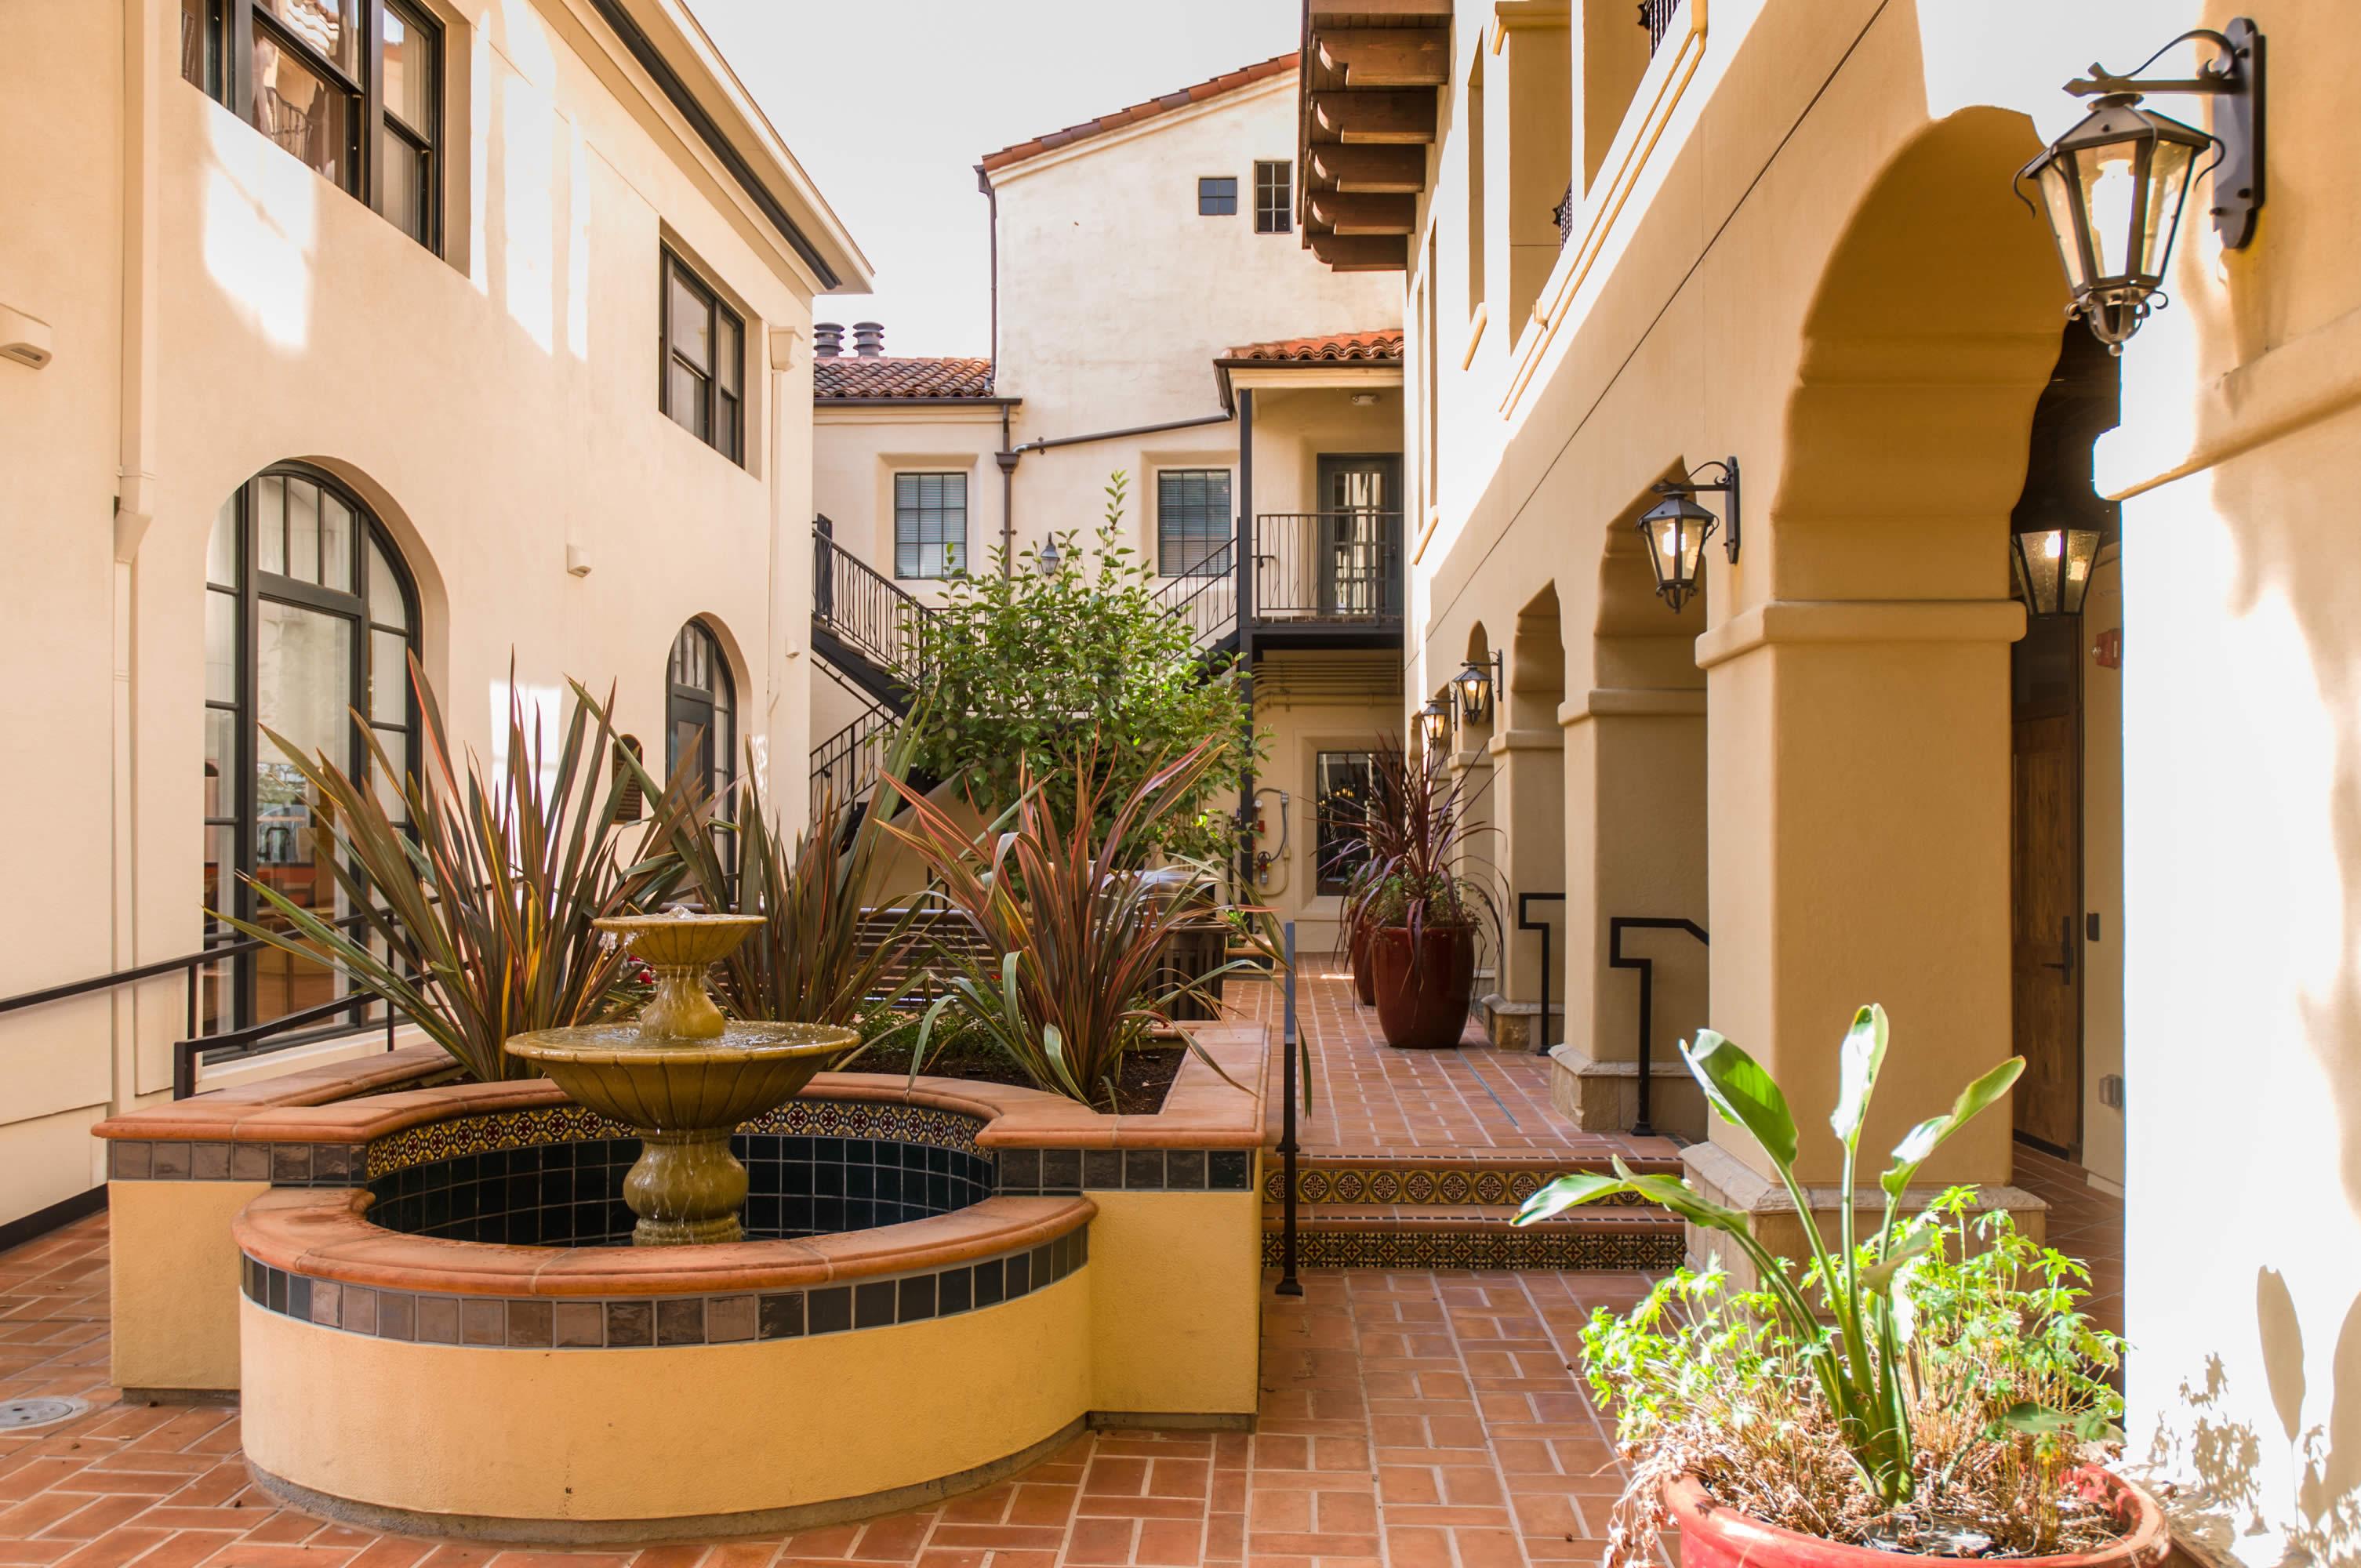 Fountain/ Courtyard View